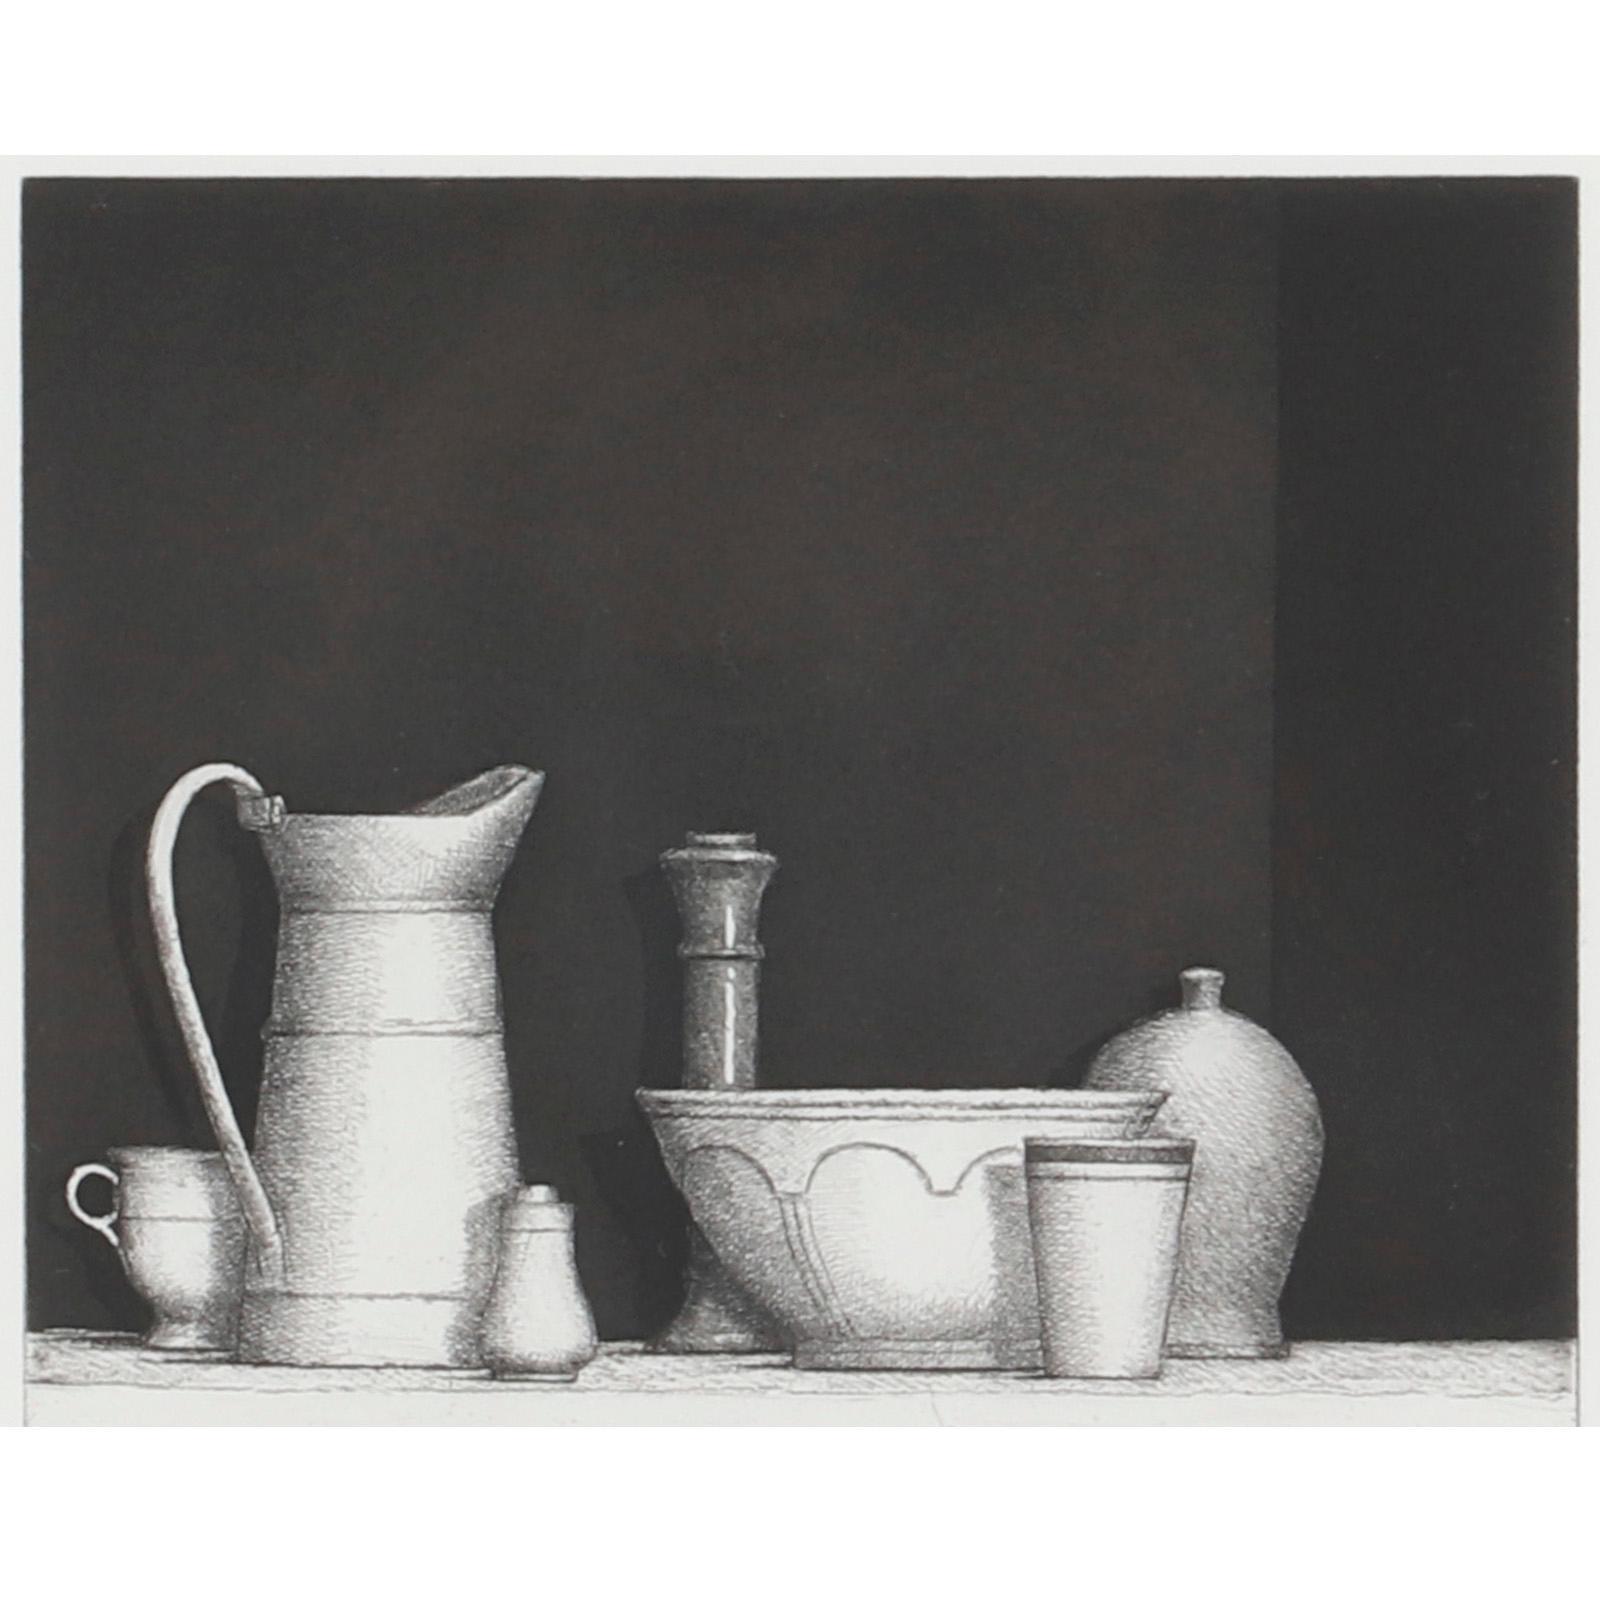 "William H. Bailey, (American, 1930-2020), still life, 1996, etching, 7""H x 8""W (image), 18""H x 18""W (frame)."